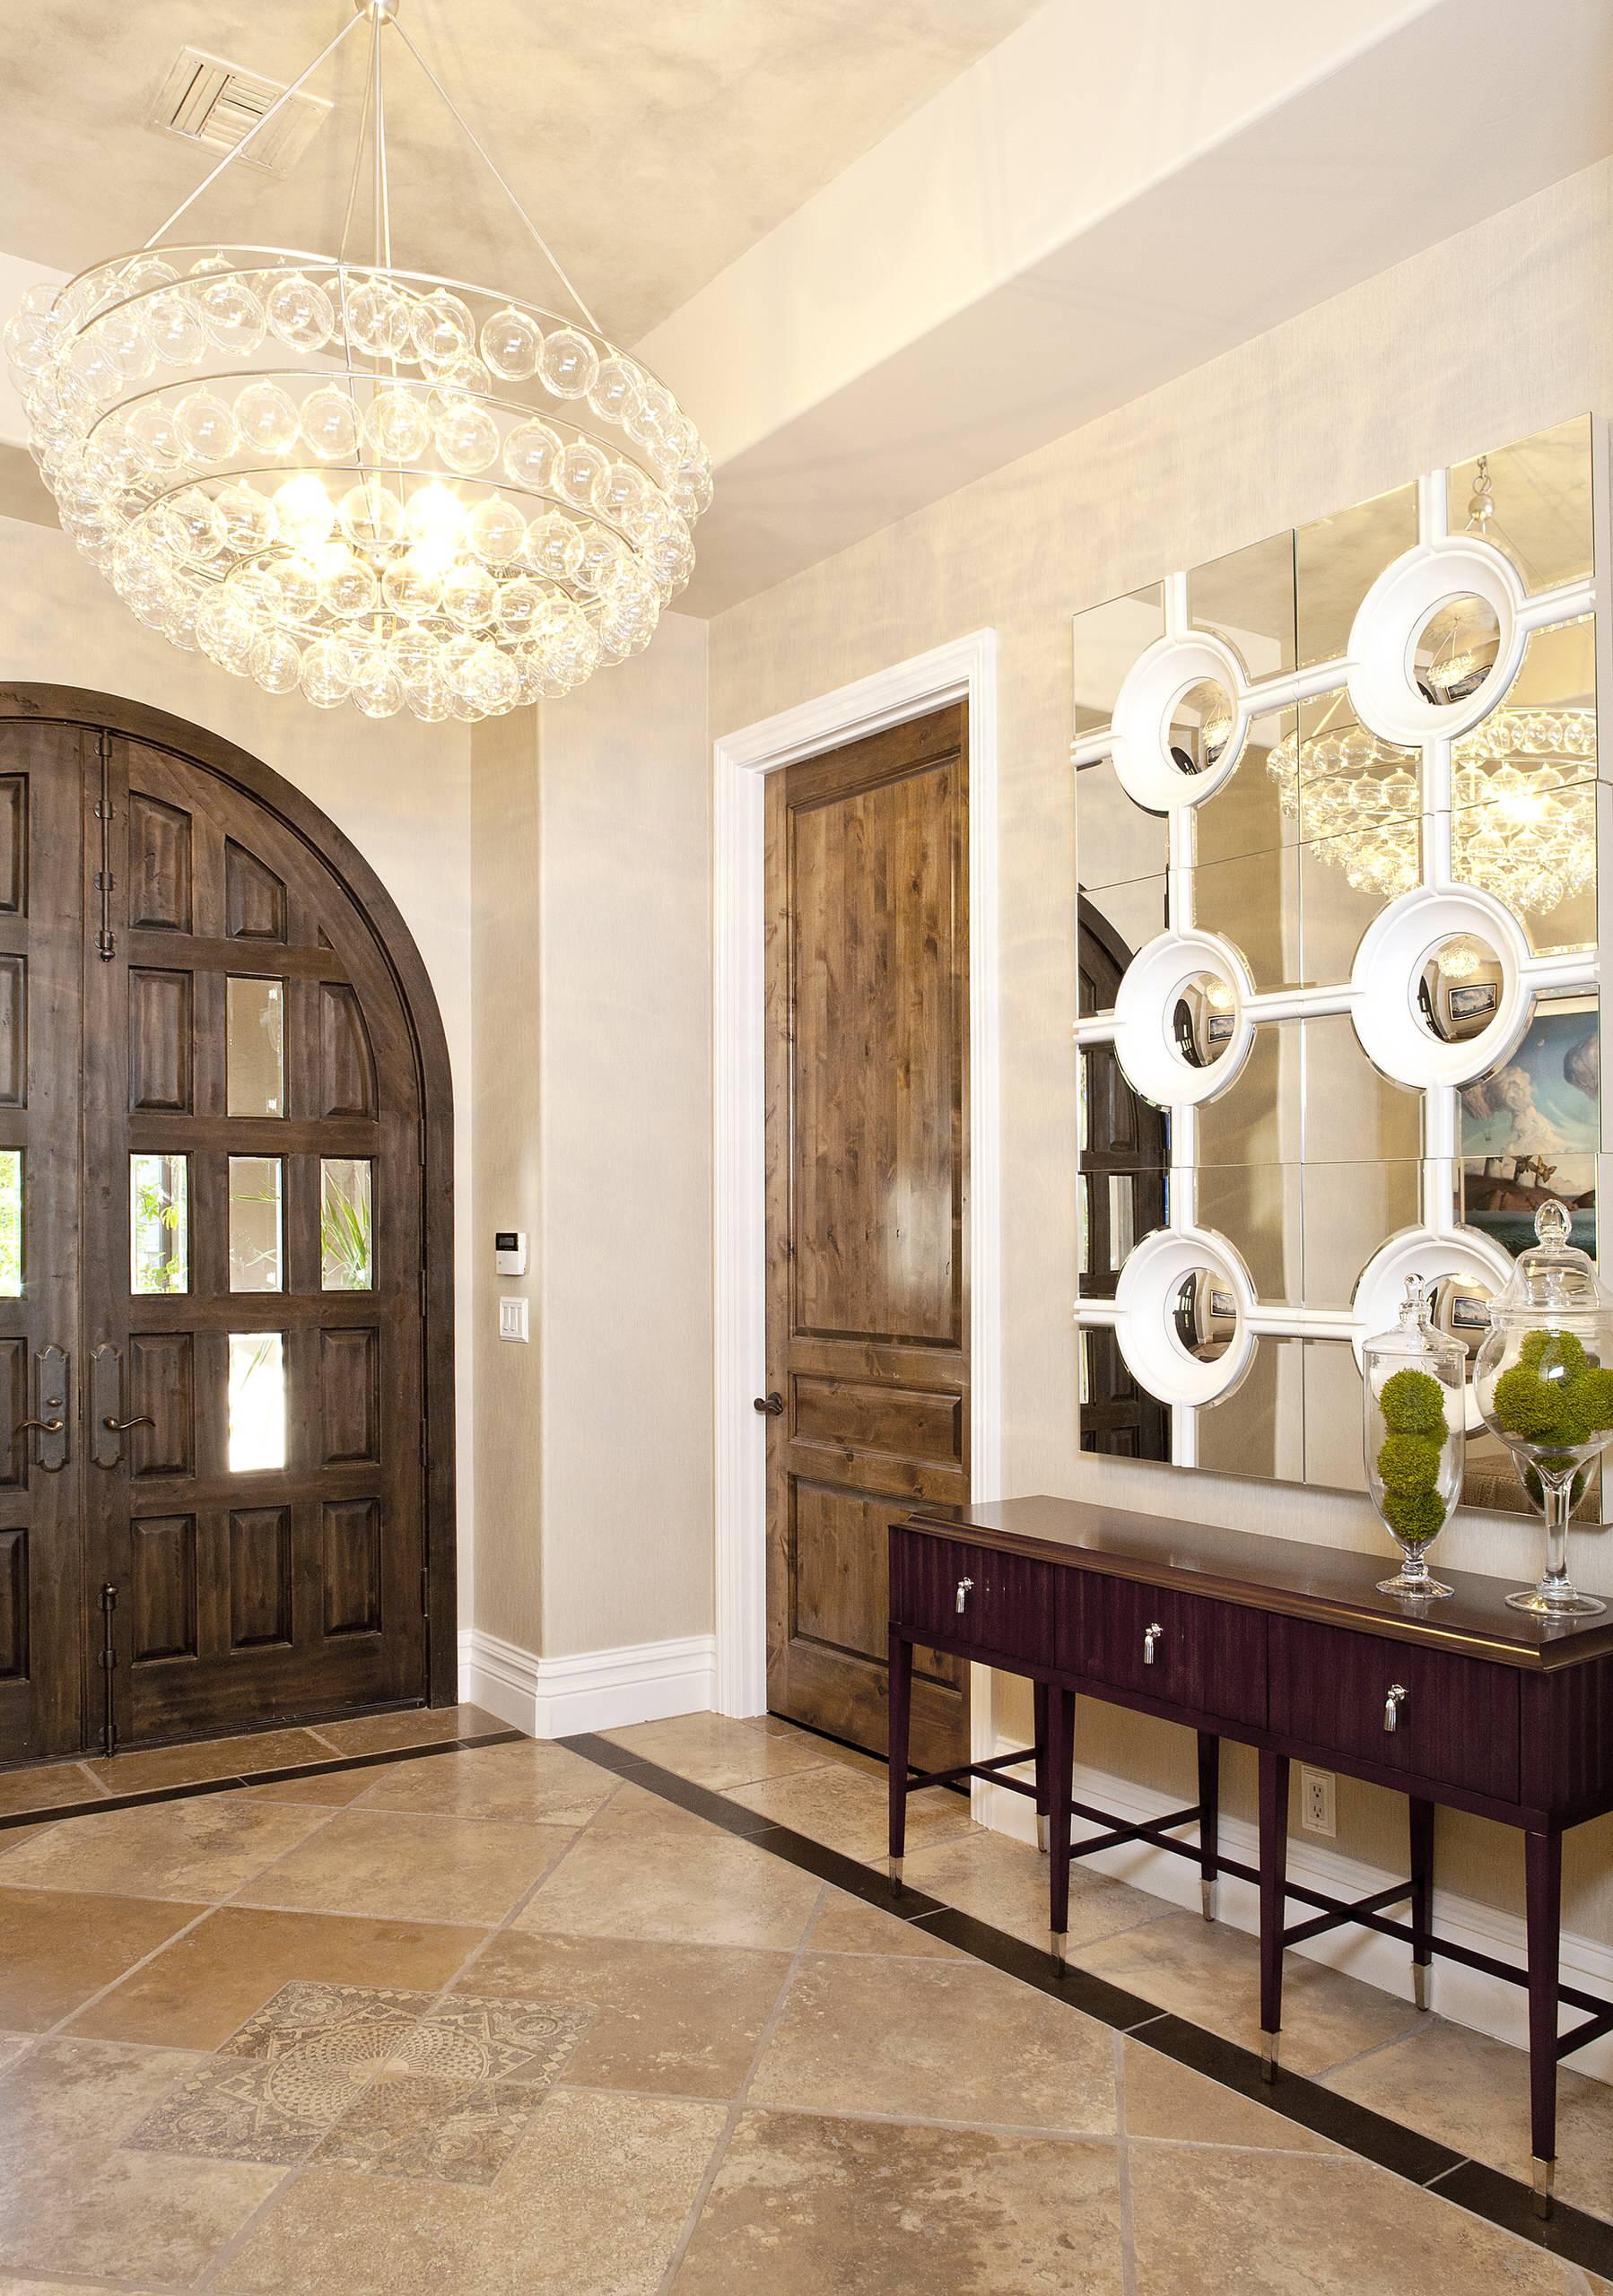 75 Beautiful Marble Floor Entryway Pictures Ideas December 2020 Houzz